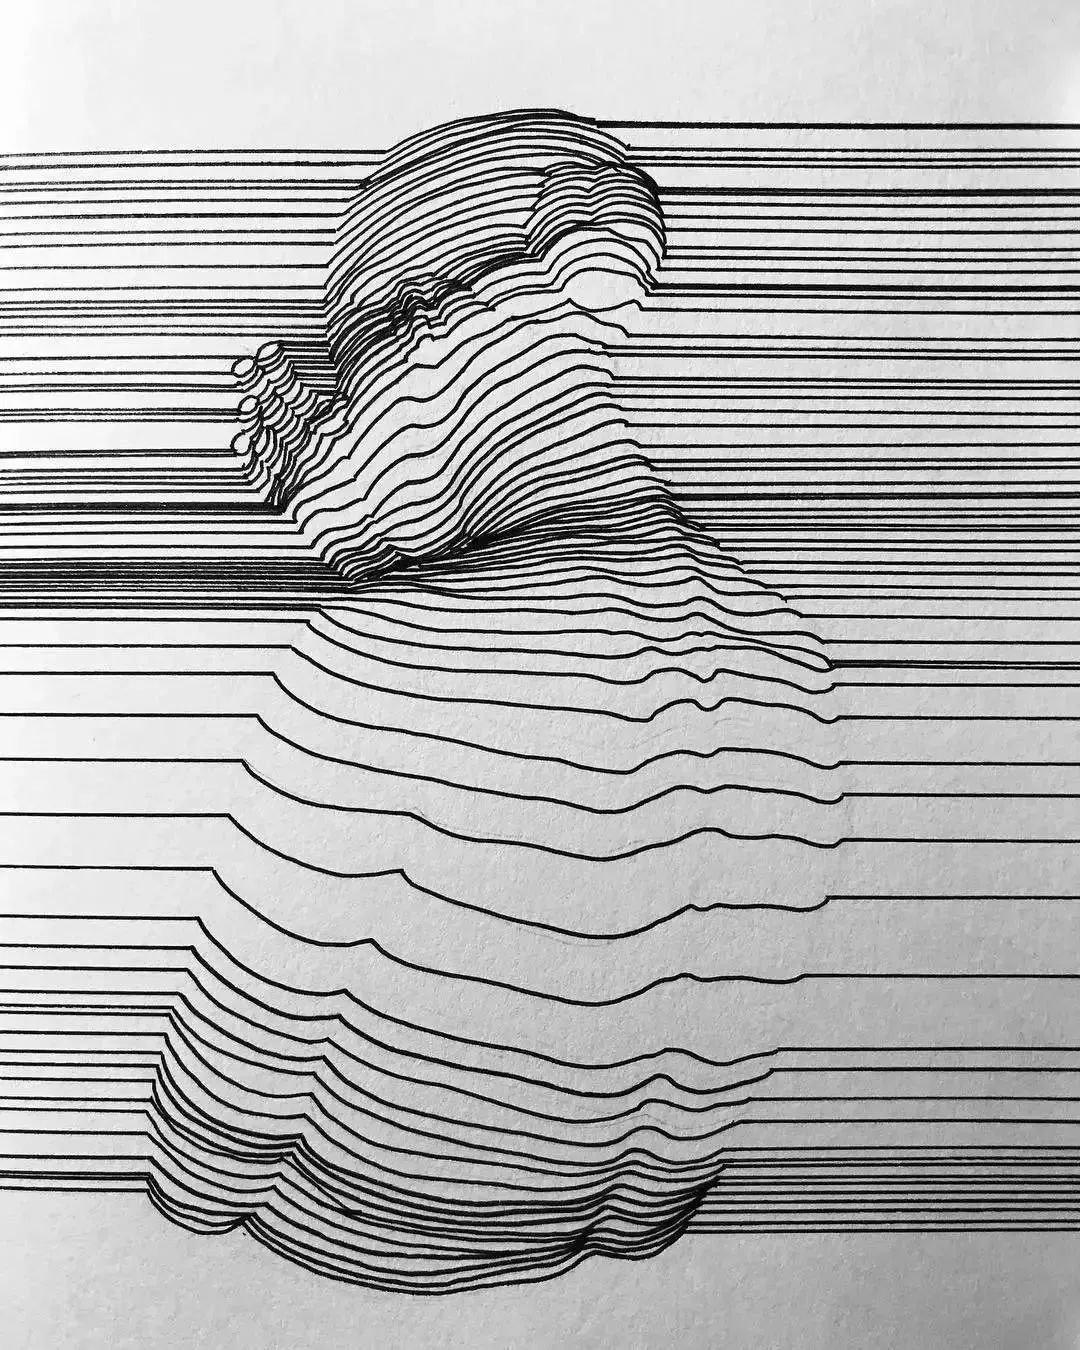 Рисунки из линий на компьютере